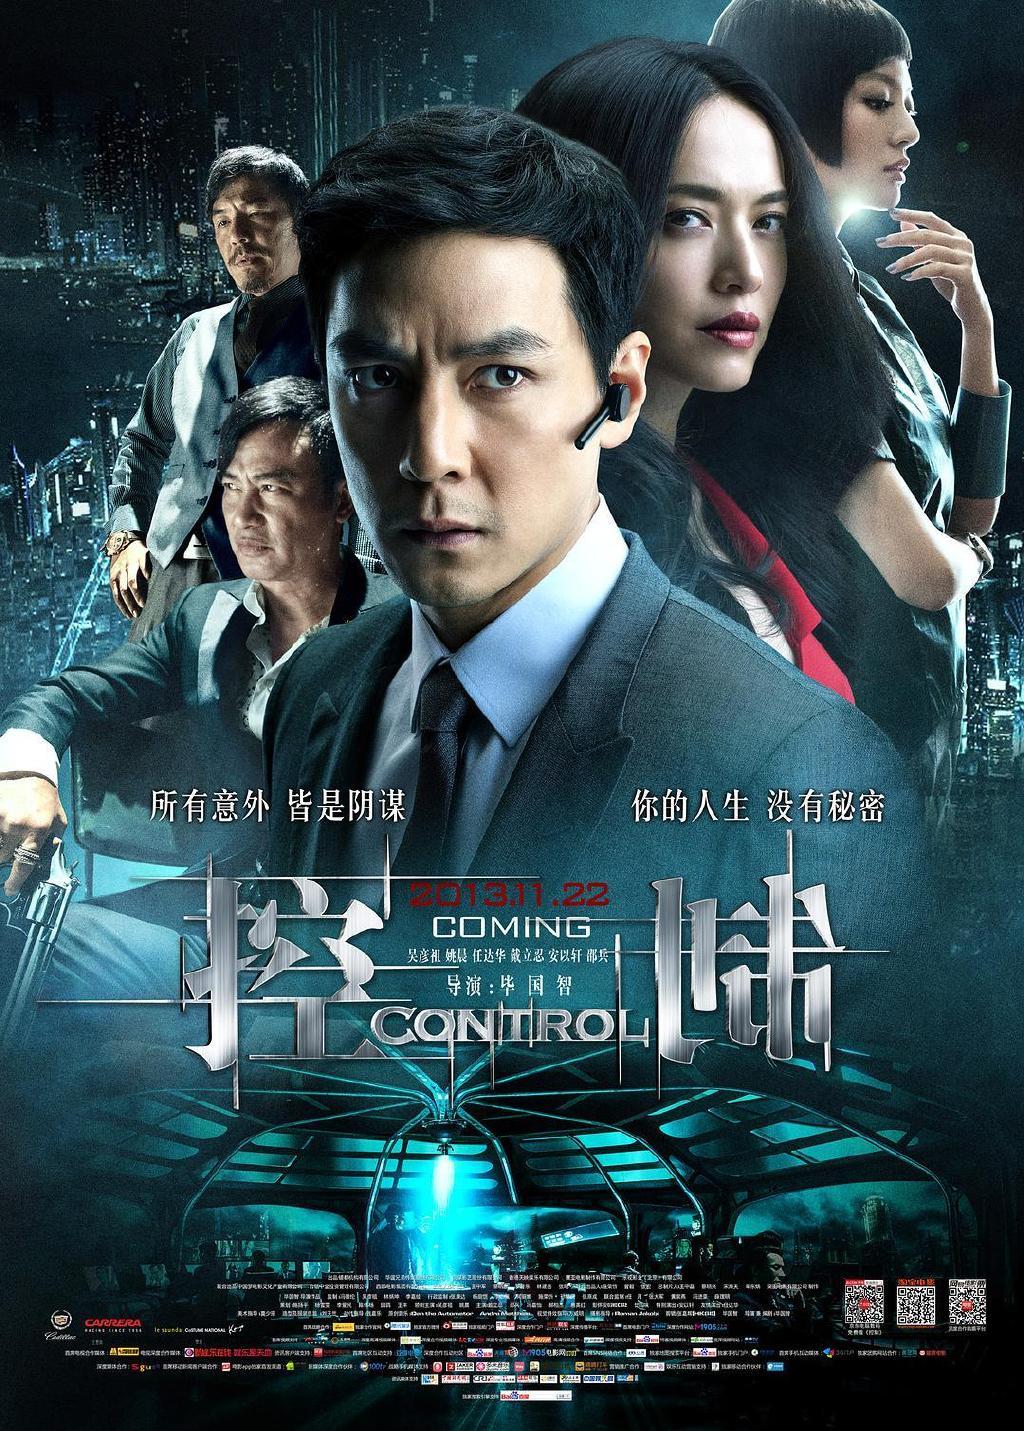 控制Control